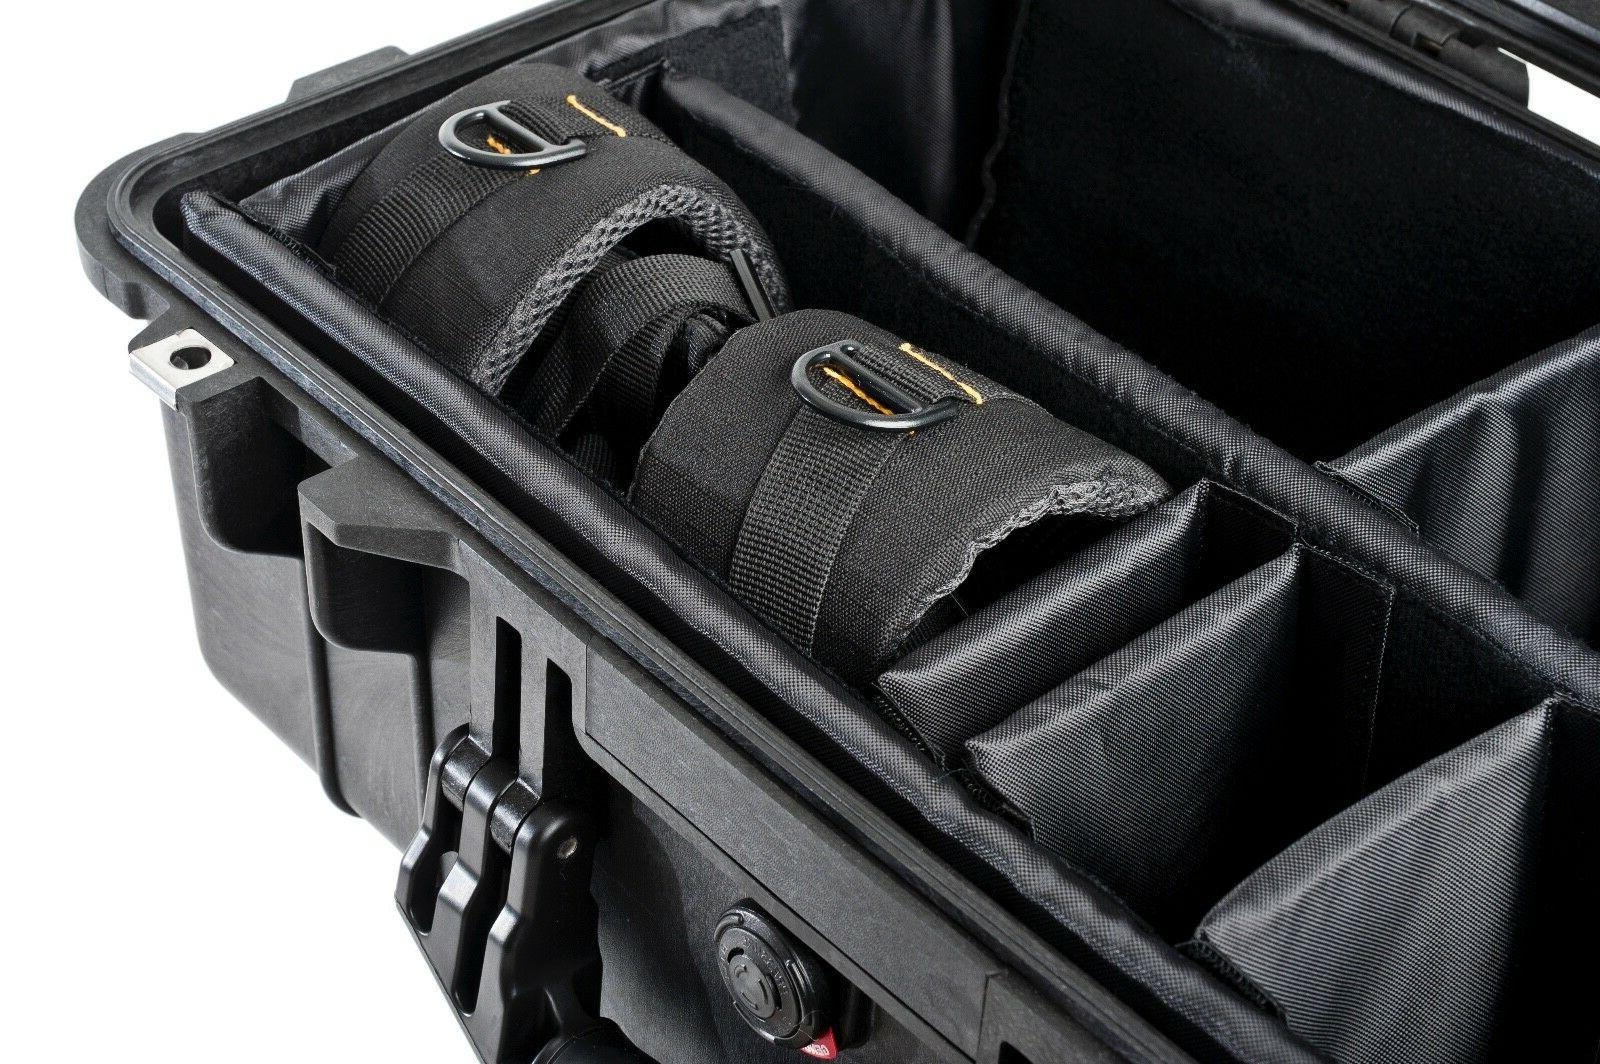 98566b5a42 RucPac Backpack for Peli/Pelican 1510/1535/1560+/ Storm. RucPac Hardcase ...